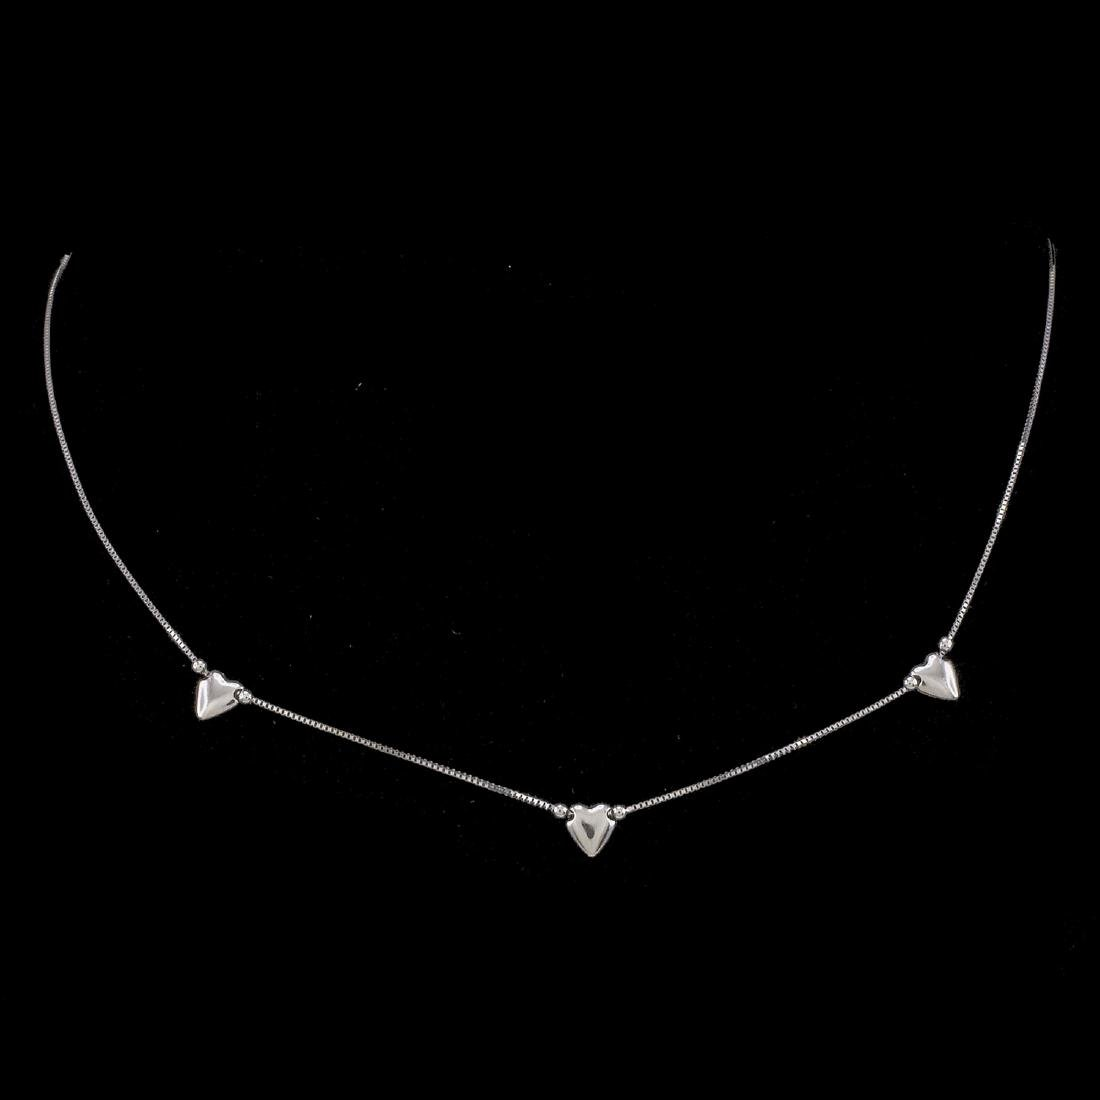 *Fine Jewelry 14KT White Gold Box Chain W 3 Station